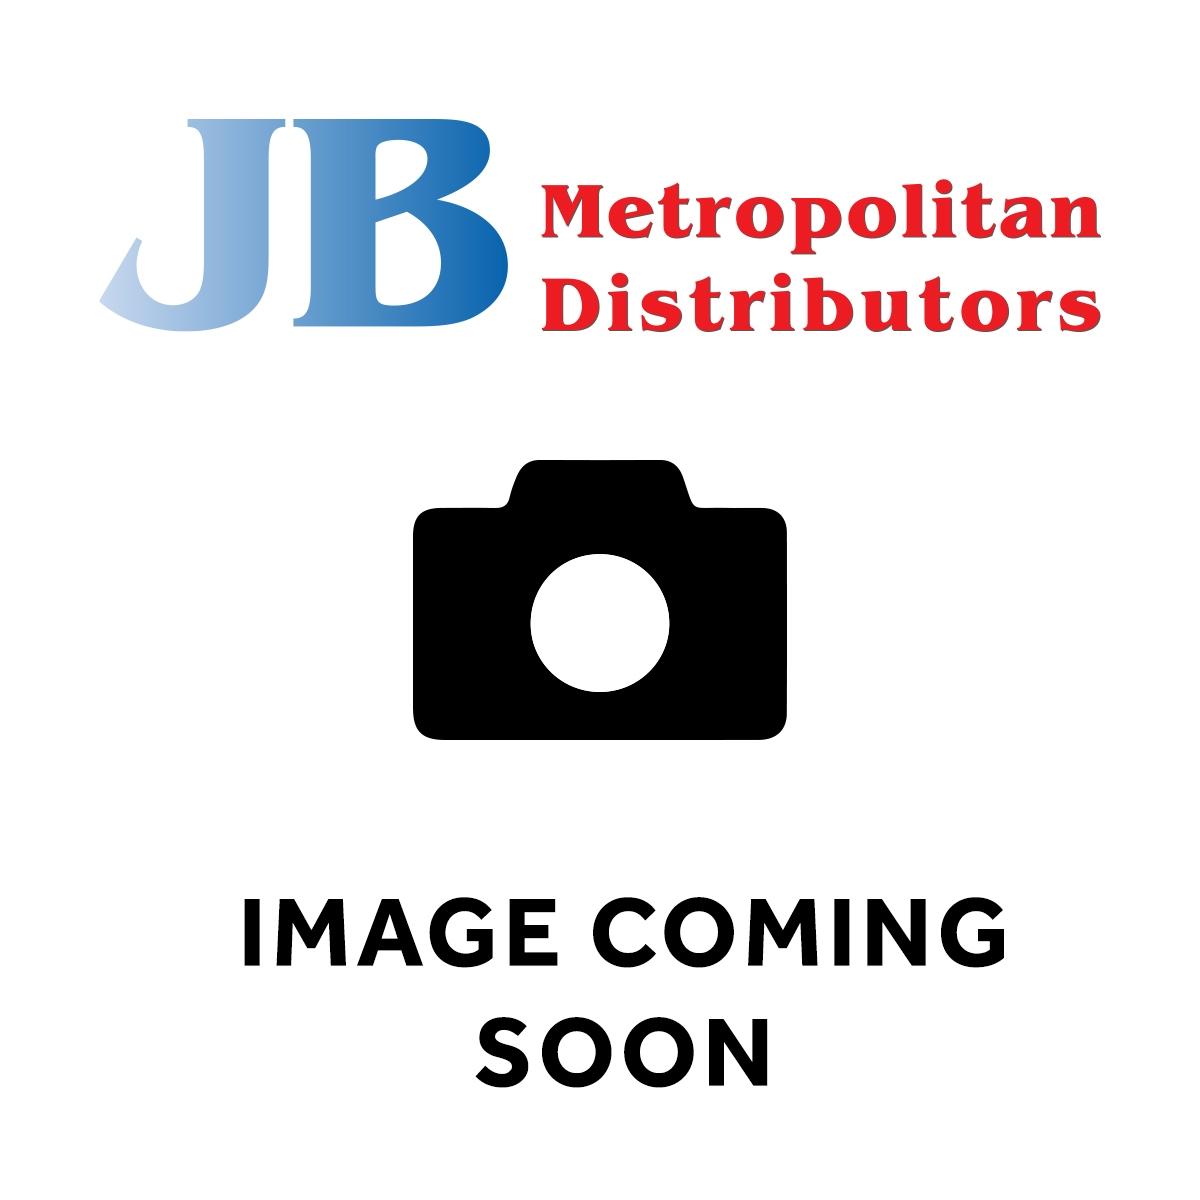 170G CADBURY MARVELLOUS CREATION SPIDER LEMONADE